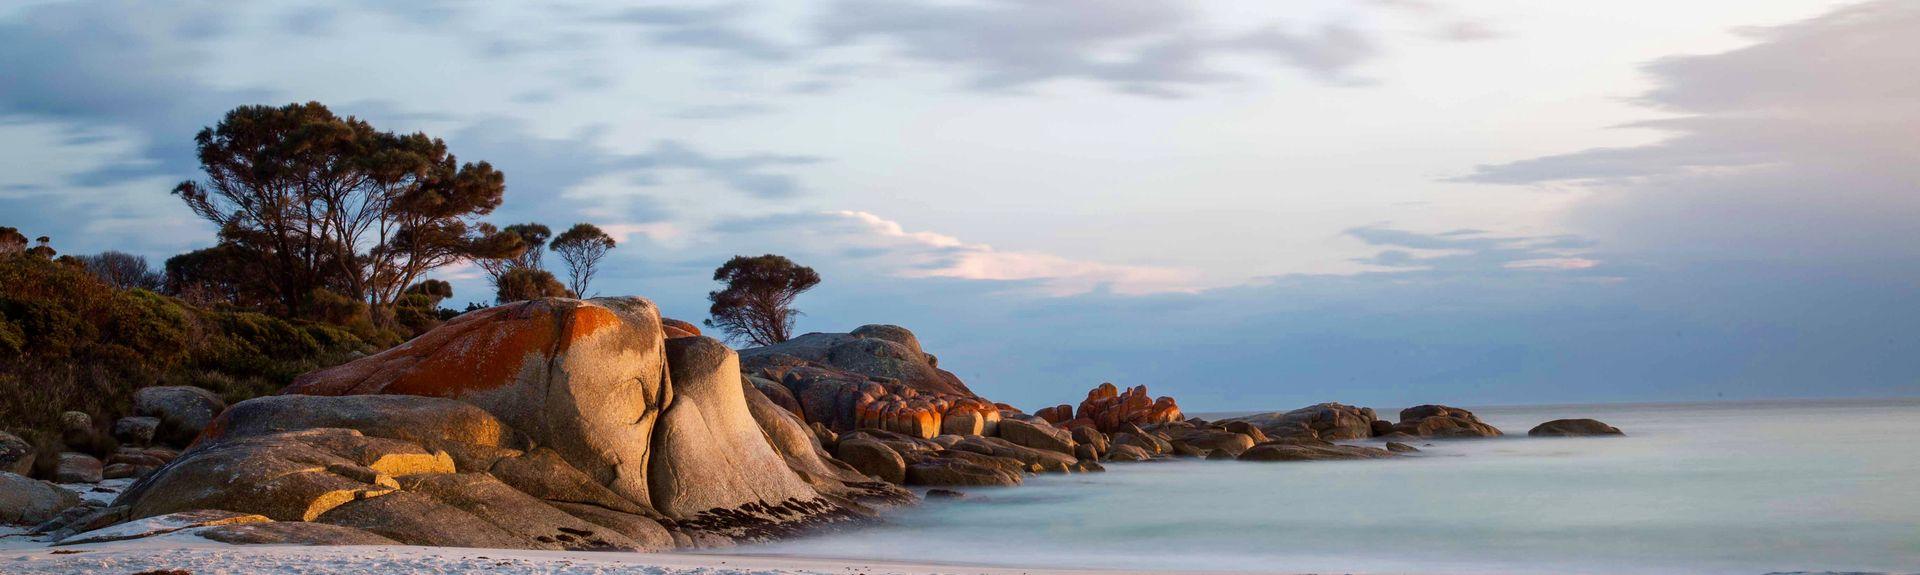 Scamander Beach, Scamander, Tasmania, Australia